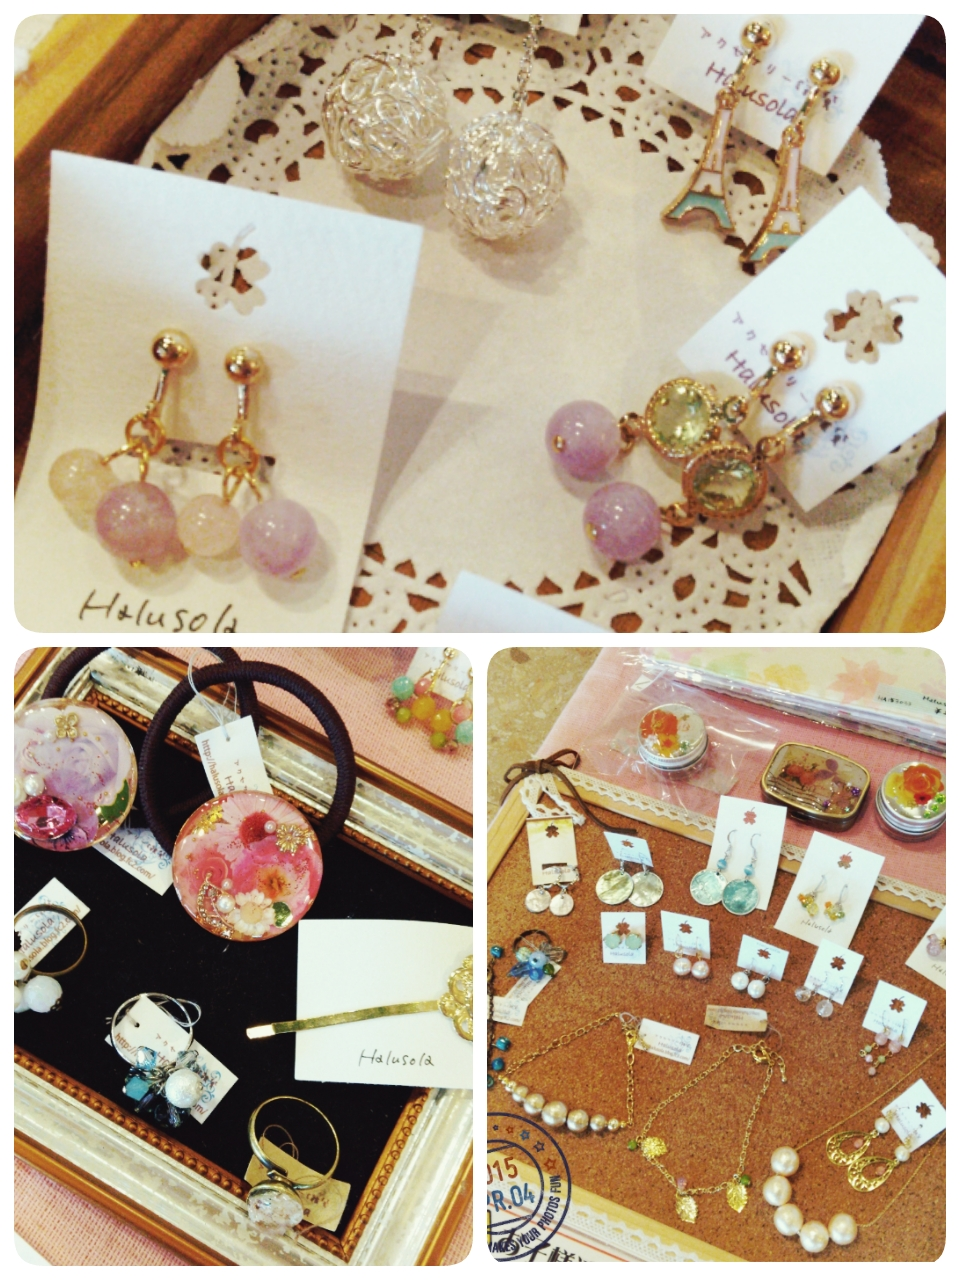 LINEcamera_share_2015-04-05-14-32-11.jpg